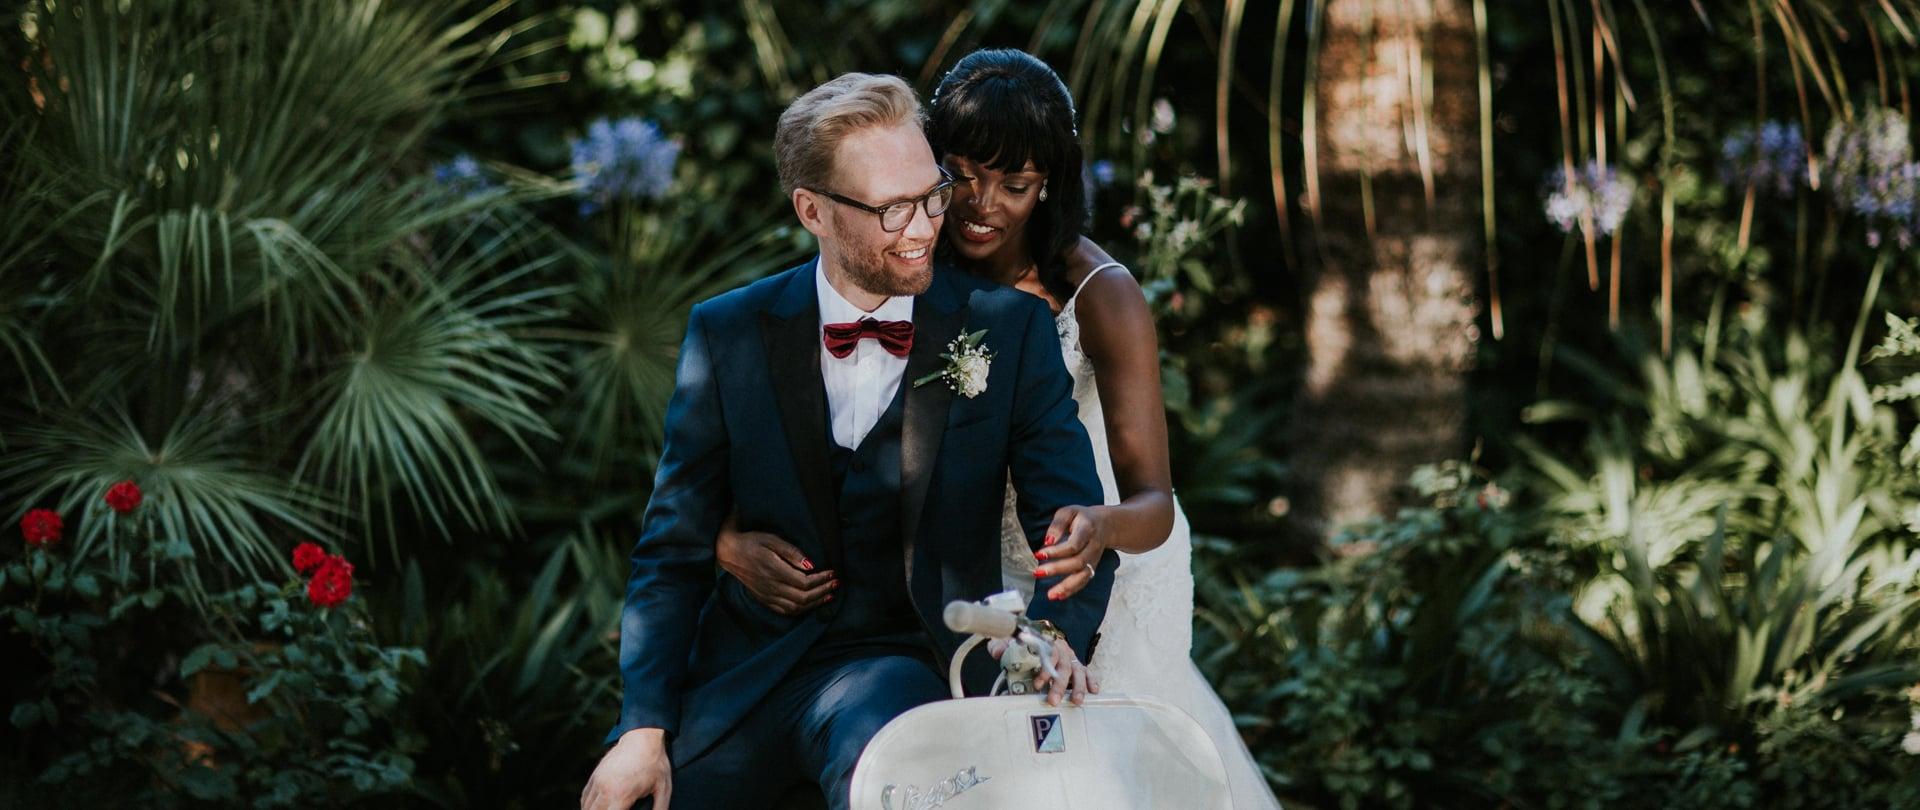 Abisola & James Wedding Video Filmed at Sorrento, Italy